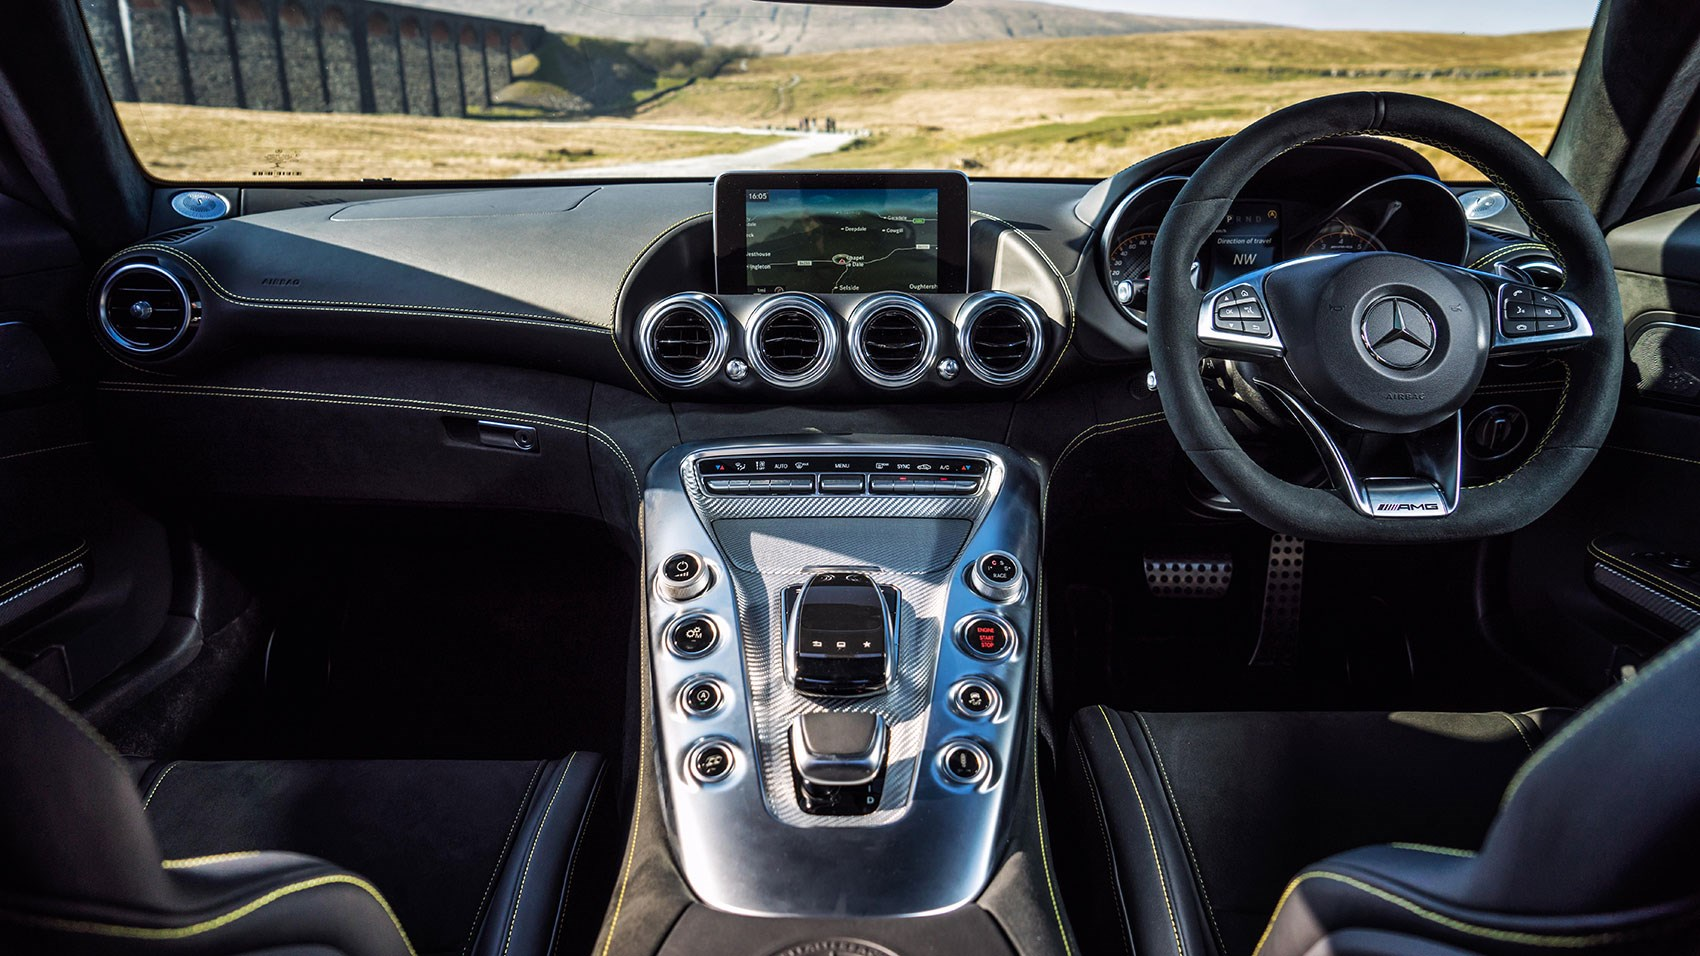 https://www.carmagazine.co.uk/Images/PageFiles/23967/Mercedes_AMG_GT_03.jpg